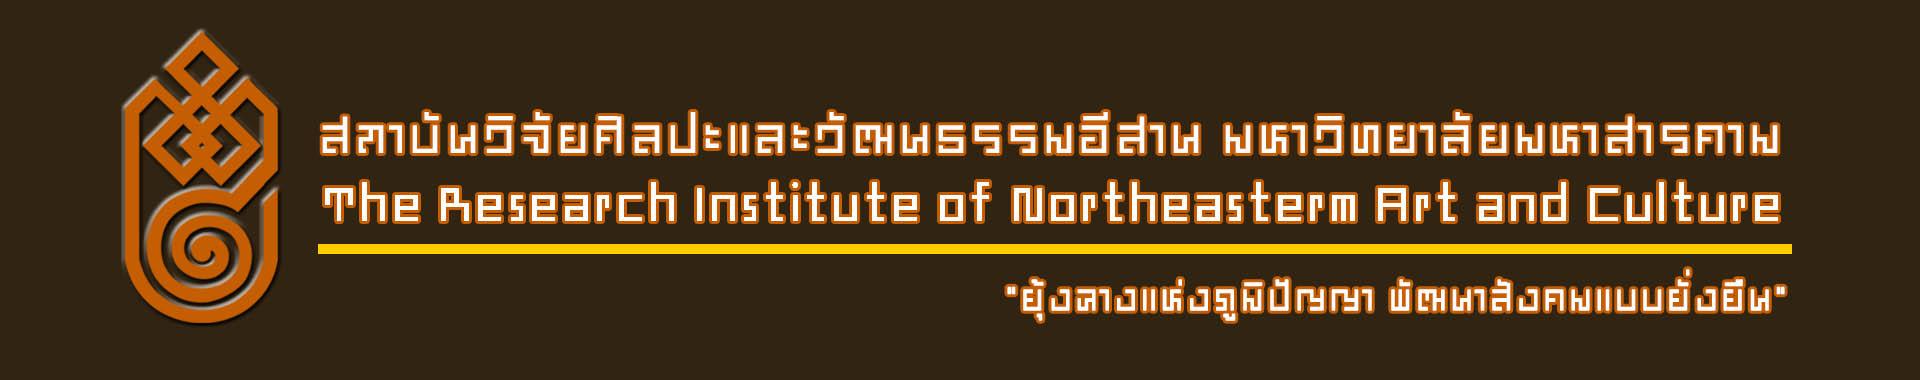 The Research Institute of Northeastern Art and Culture (RINAC) Mahasarakham University : สถาบันวิจัยศิลปะและวัฒนธรรมอีสาน มหาวิทยาลัยมหาสารคาม